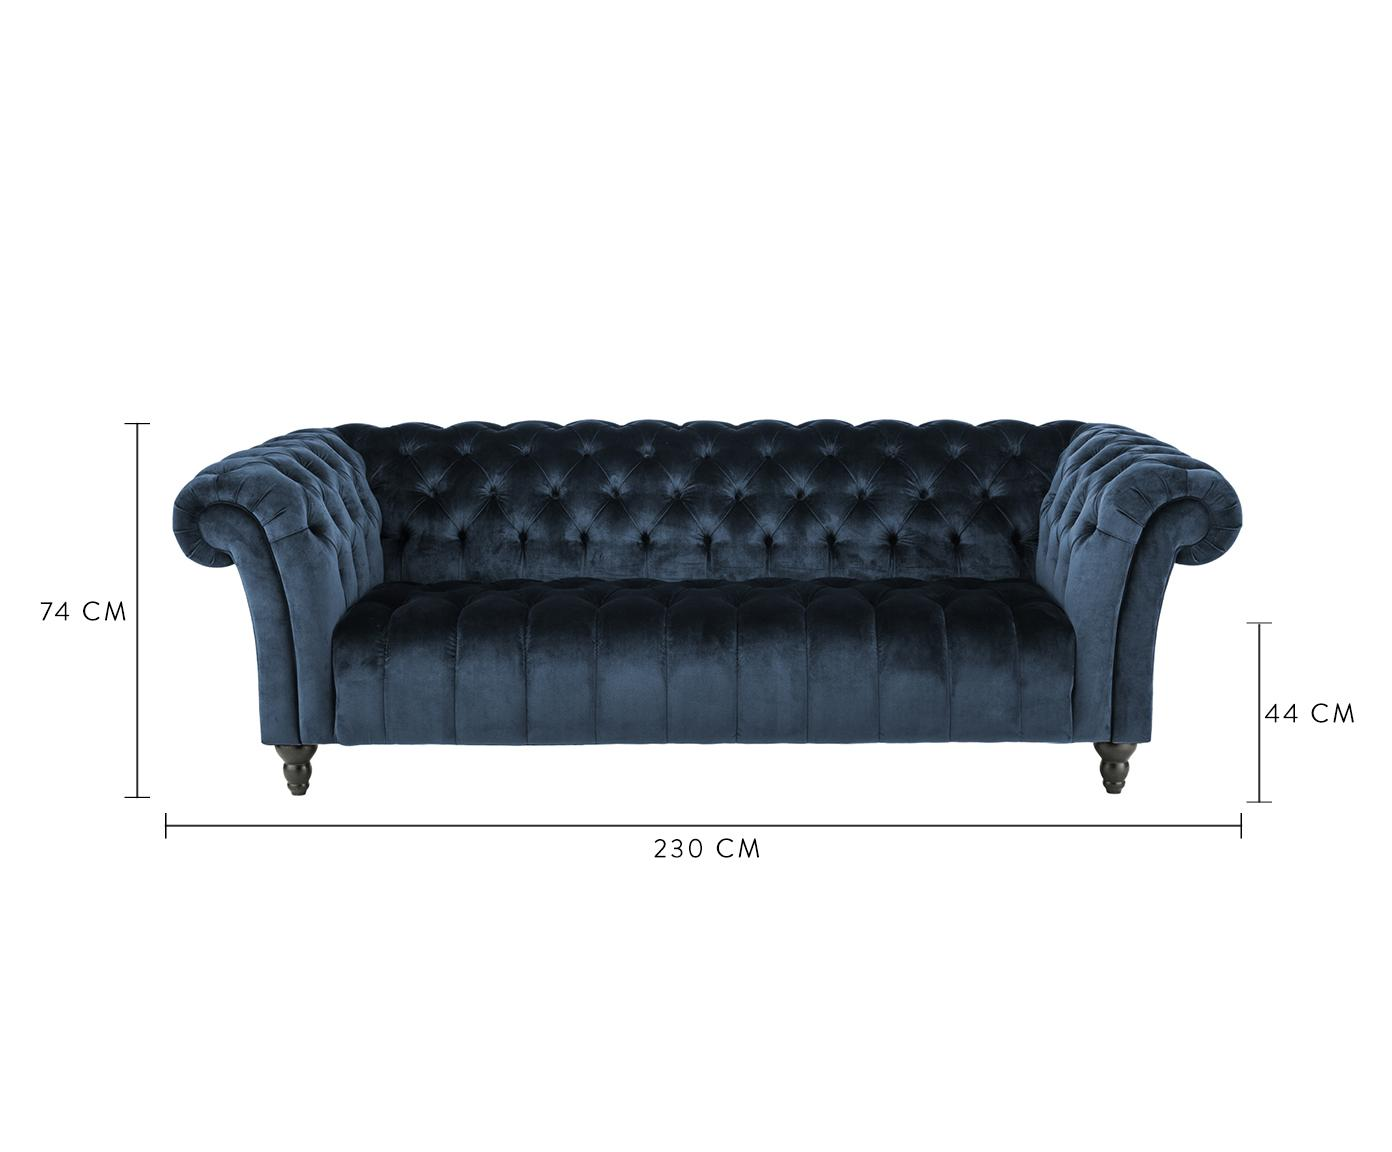 Chesterfield Samt-Sofa Gladis (3-Sitzer), Bezug: 100% Polyester, Beine: Eichenholz, lackiert, Rahmen: Holzgrundgestell, Samt Dunkelblau, 230 x 74 cm